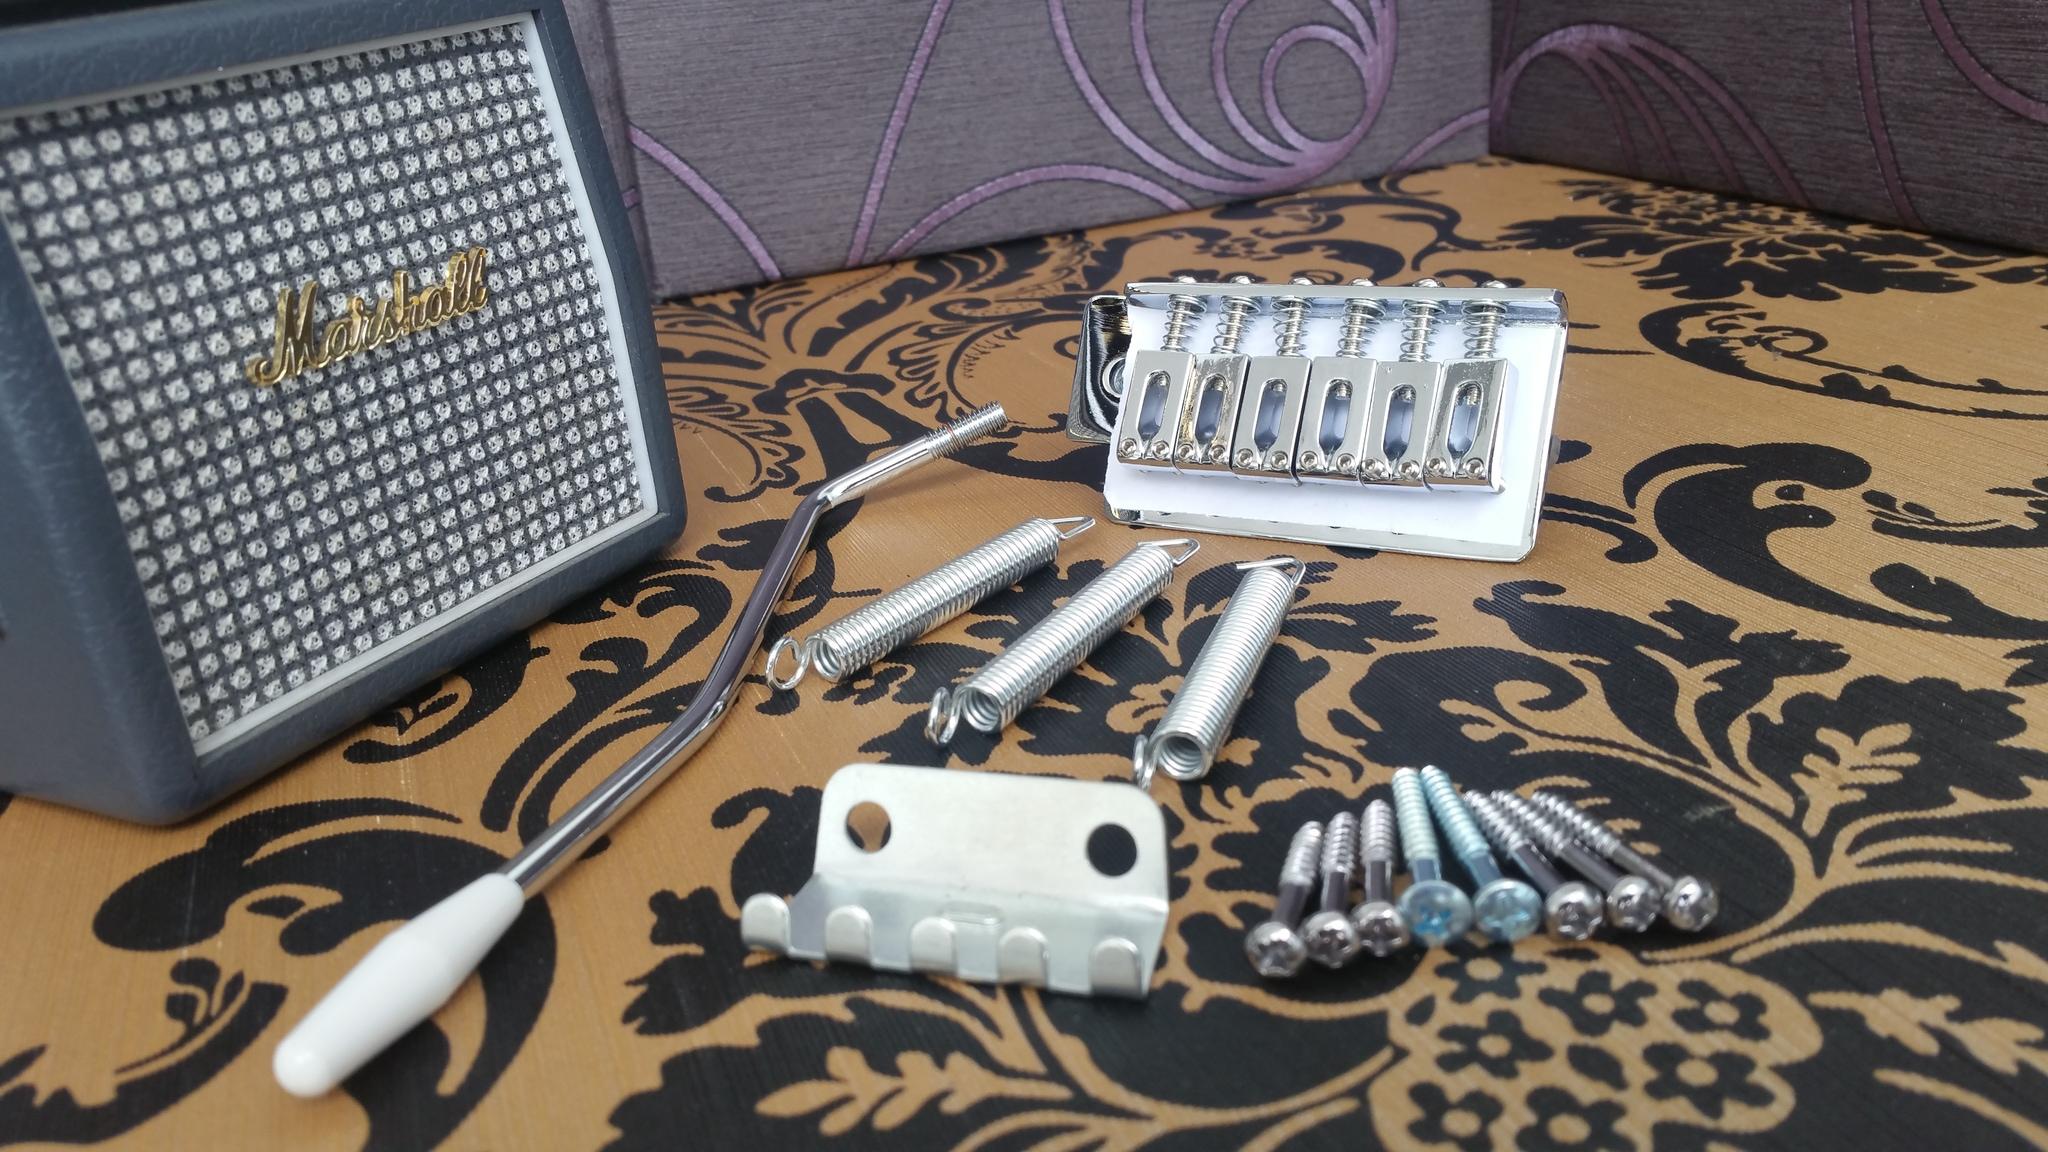 Harga Bridge Tremolo Down Semi Updown Kiri Kanan Kidal Gitar Listrik Fender Chrome